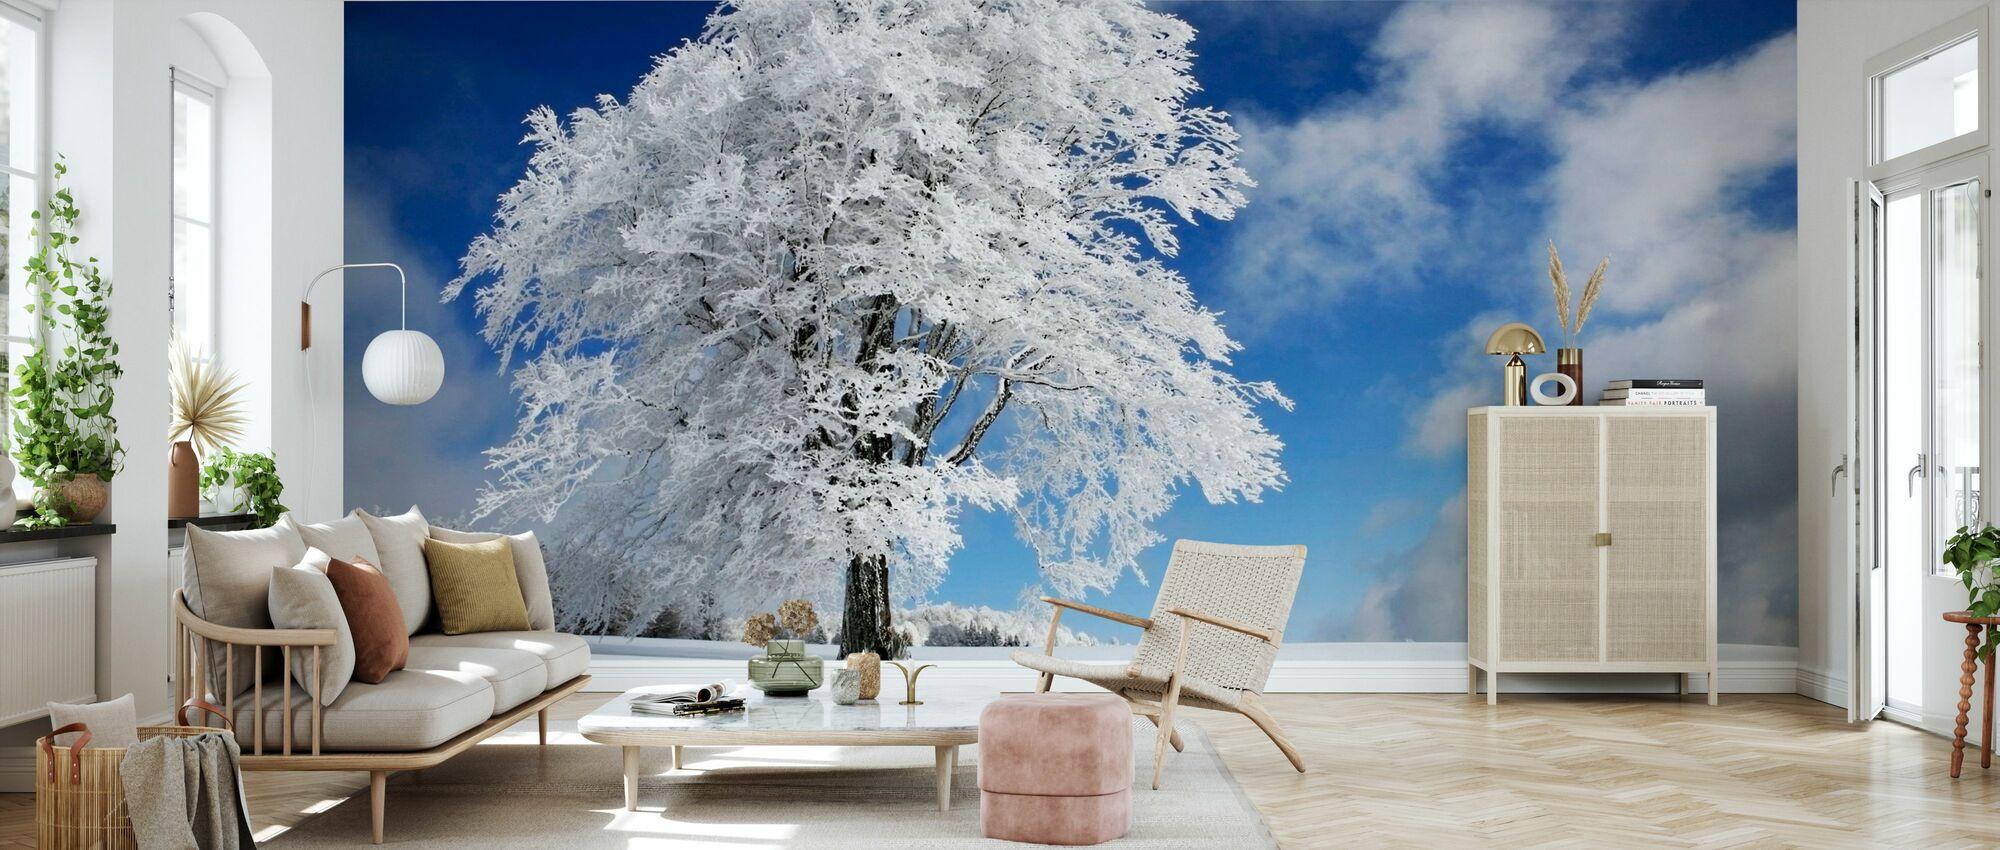 Vinter träd - Tapet - Vardagsrum